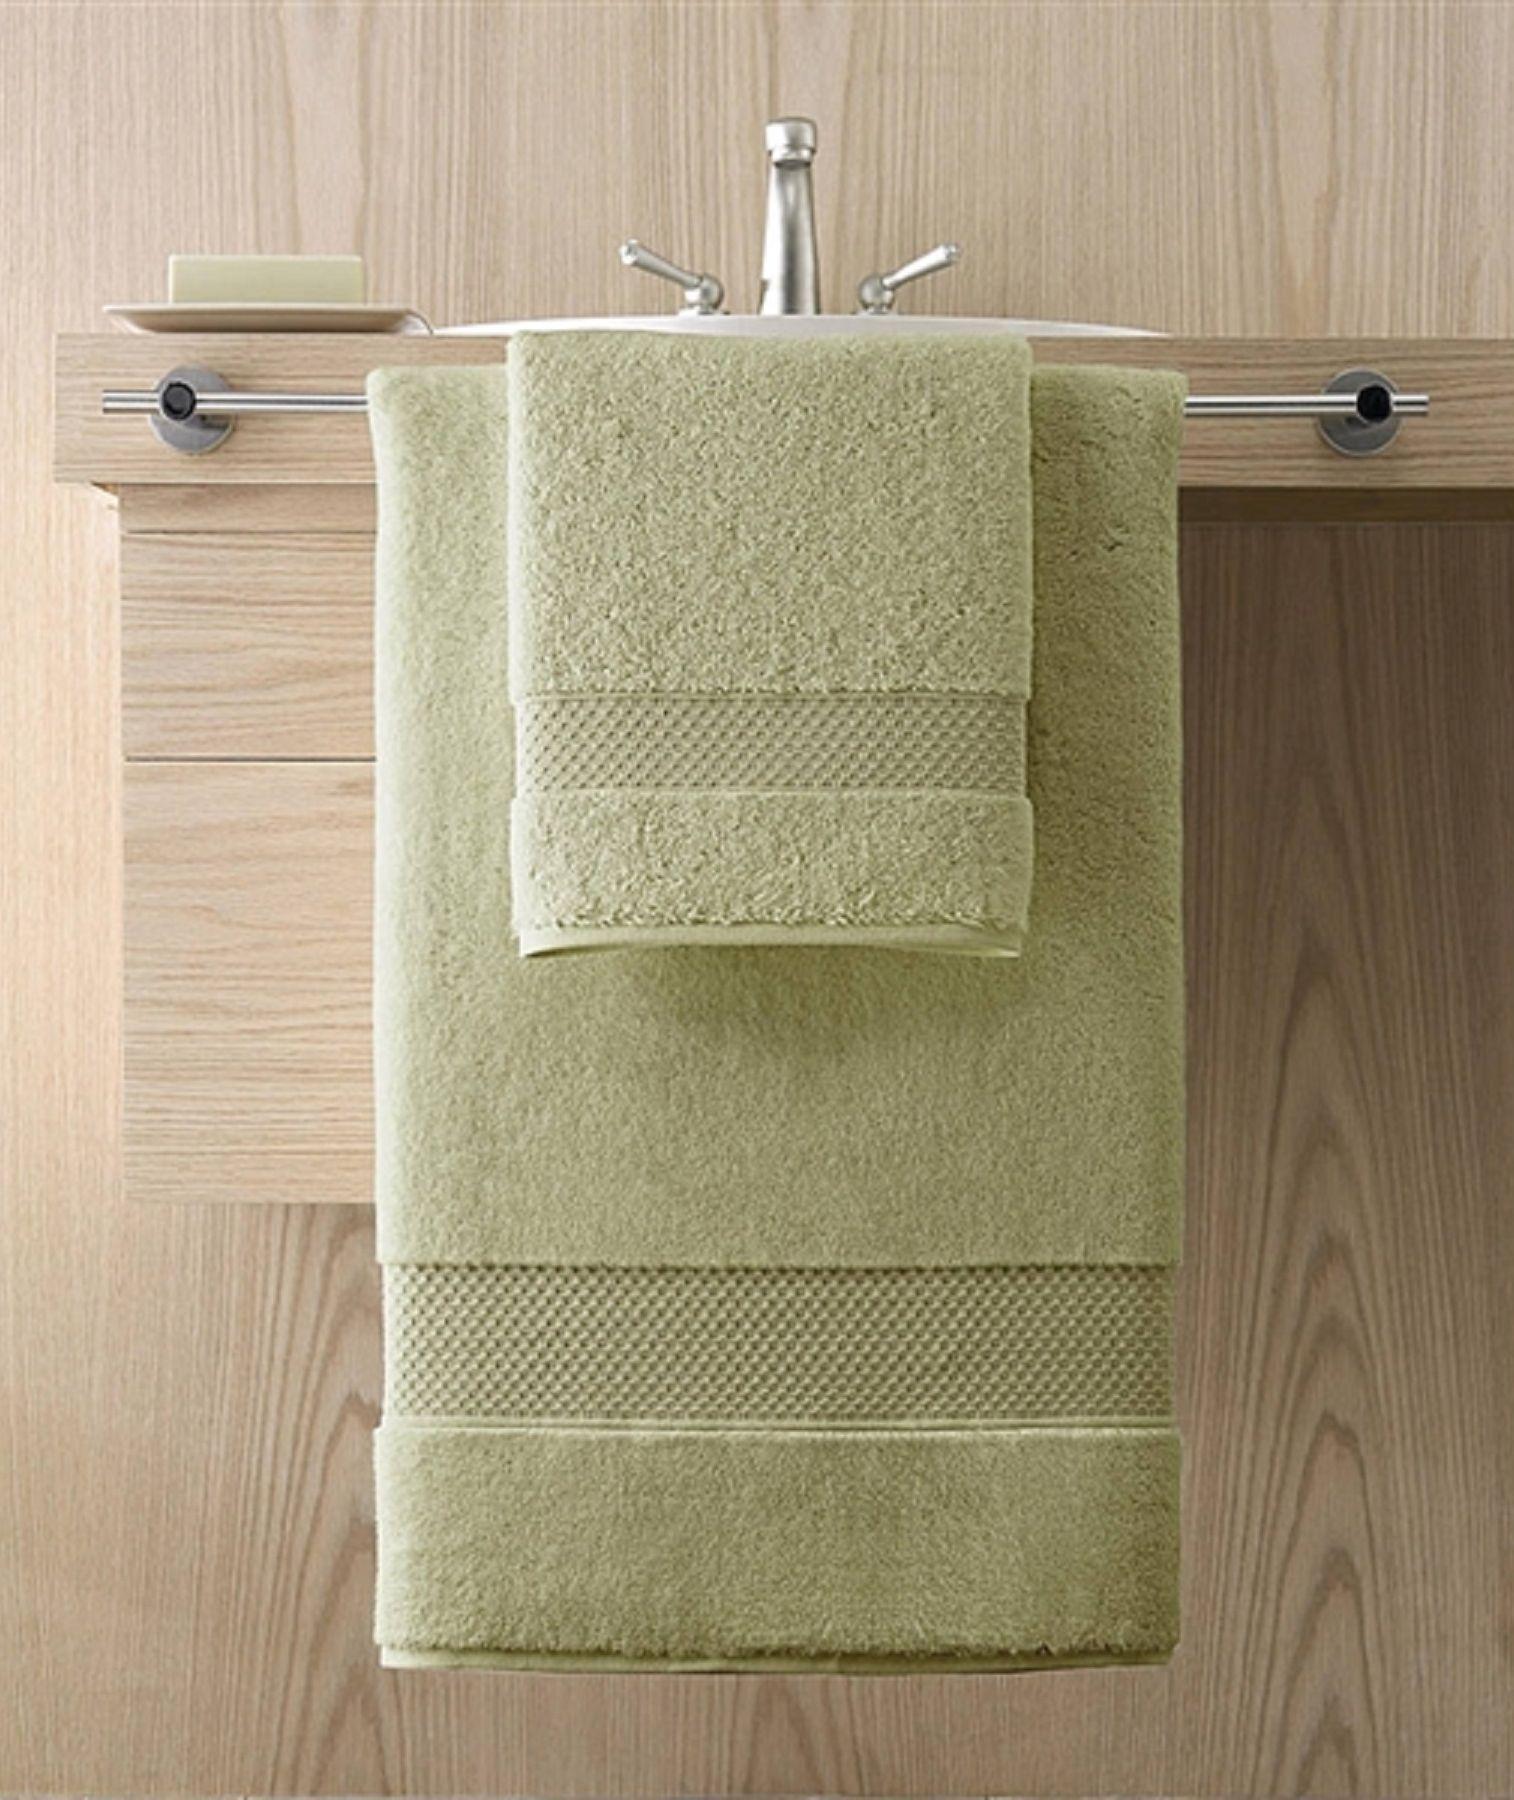 Коврики для ванной Элитный банный коврик Elegance Thyme от Kassatex elitnyy-bannyy-kovrik-elegance-thyme-ot-kassatex-portugaliya.jpg